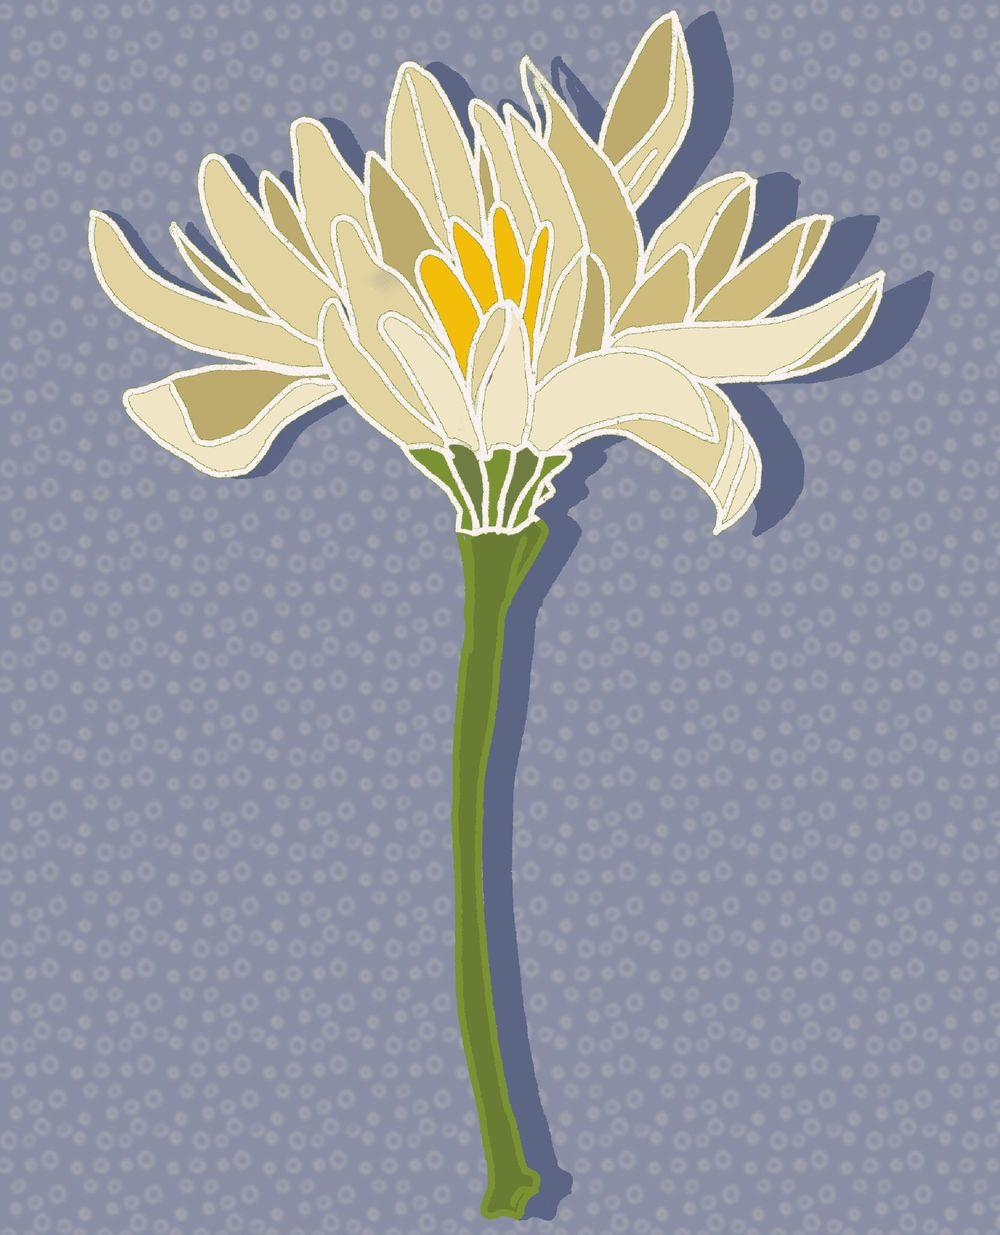 Floral album - image 2 - student project